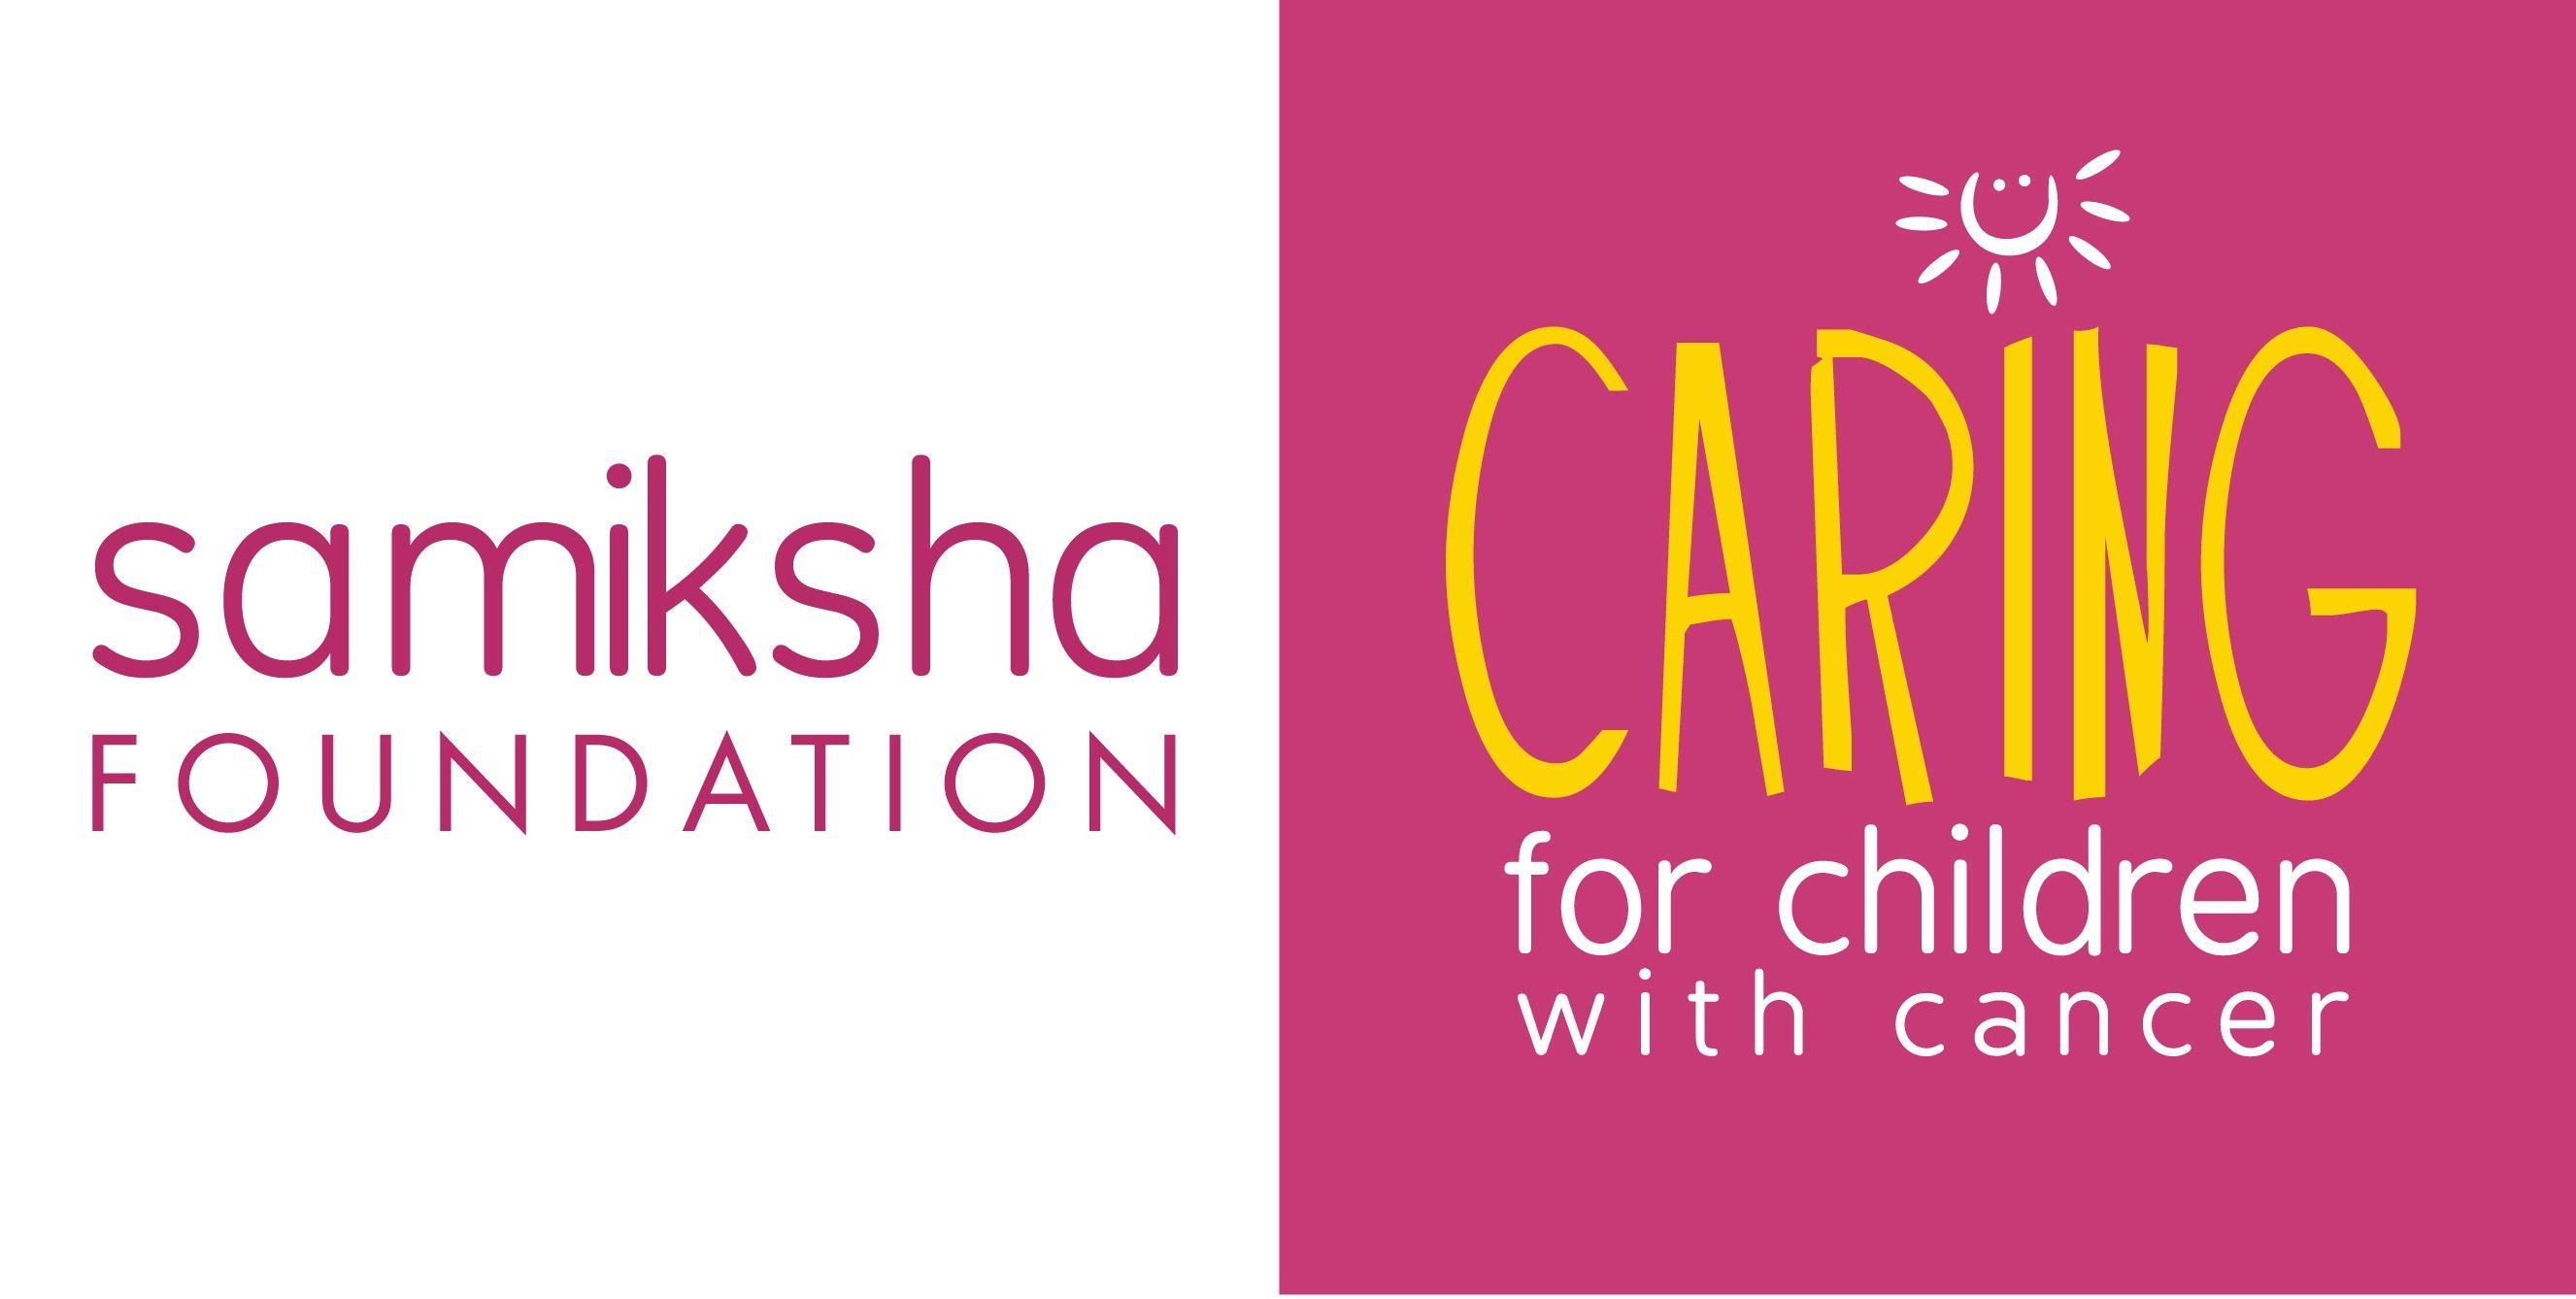 Samiksha Foundation - Caring for Children with Cancer Trust